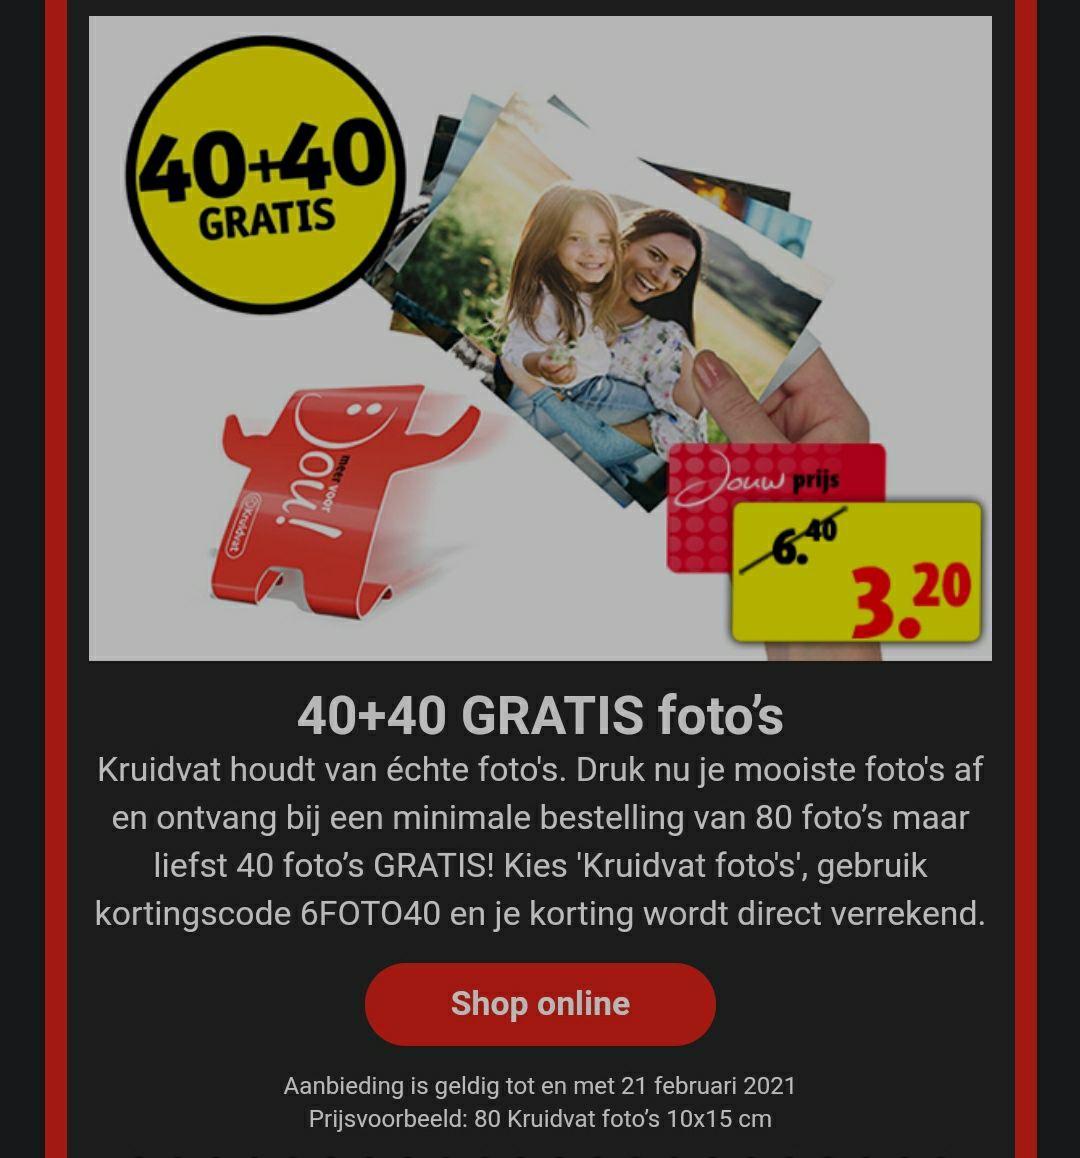 40 + 40 foto's gratis bij Kruidvat foto's